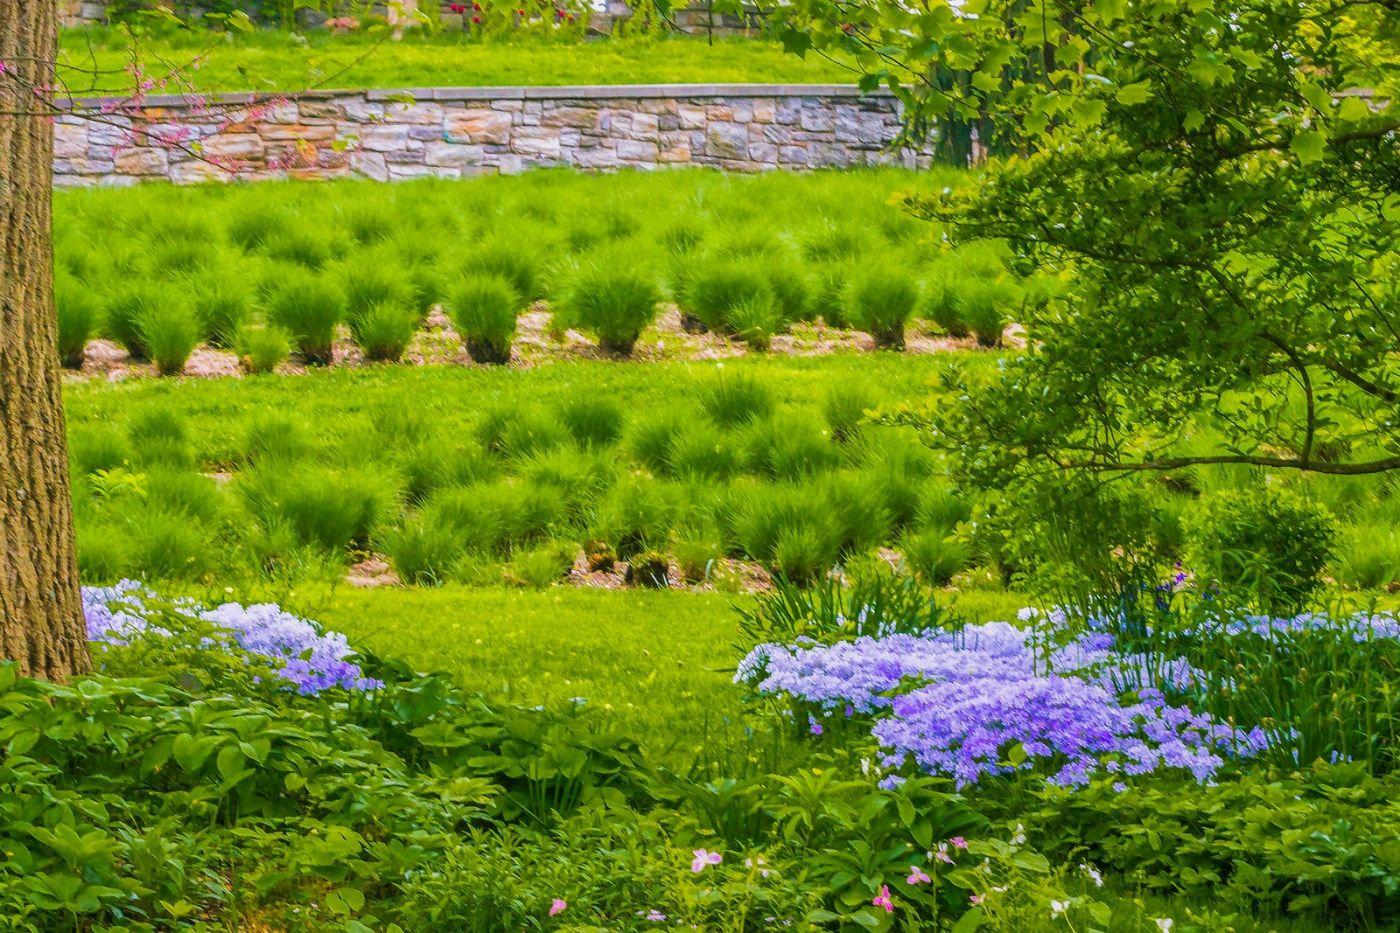 Chanticleer花园,春风得意_图1-2